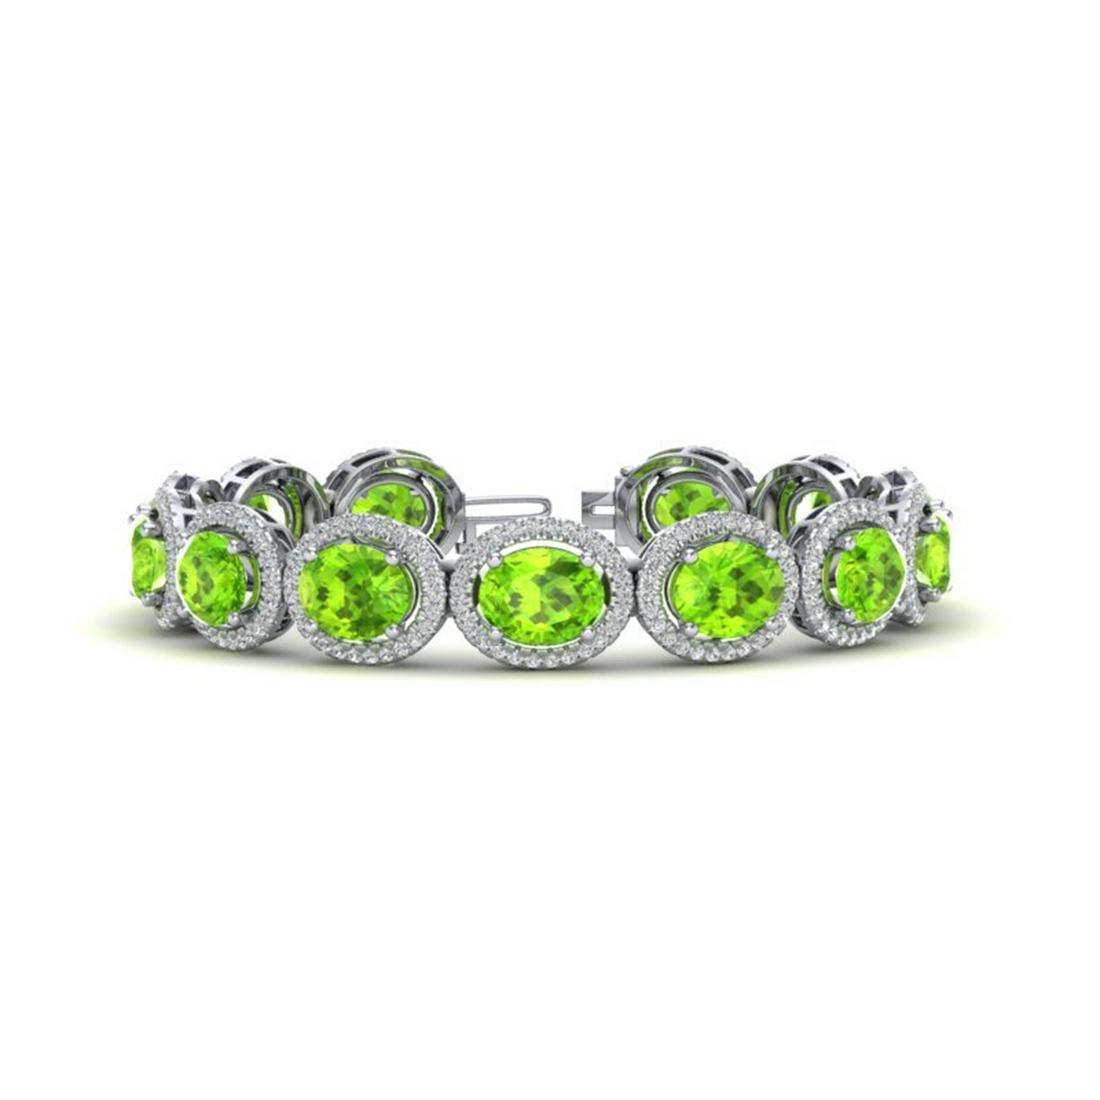 27 ctw Peridot & VS/SI Diamond Bracelet 10K White Gold